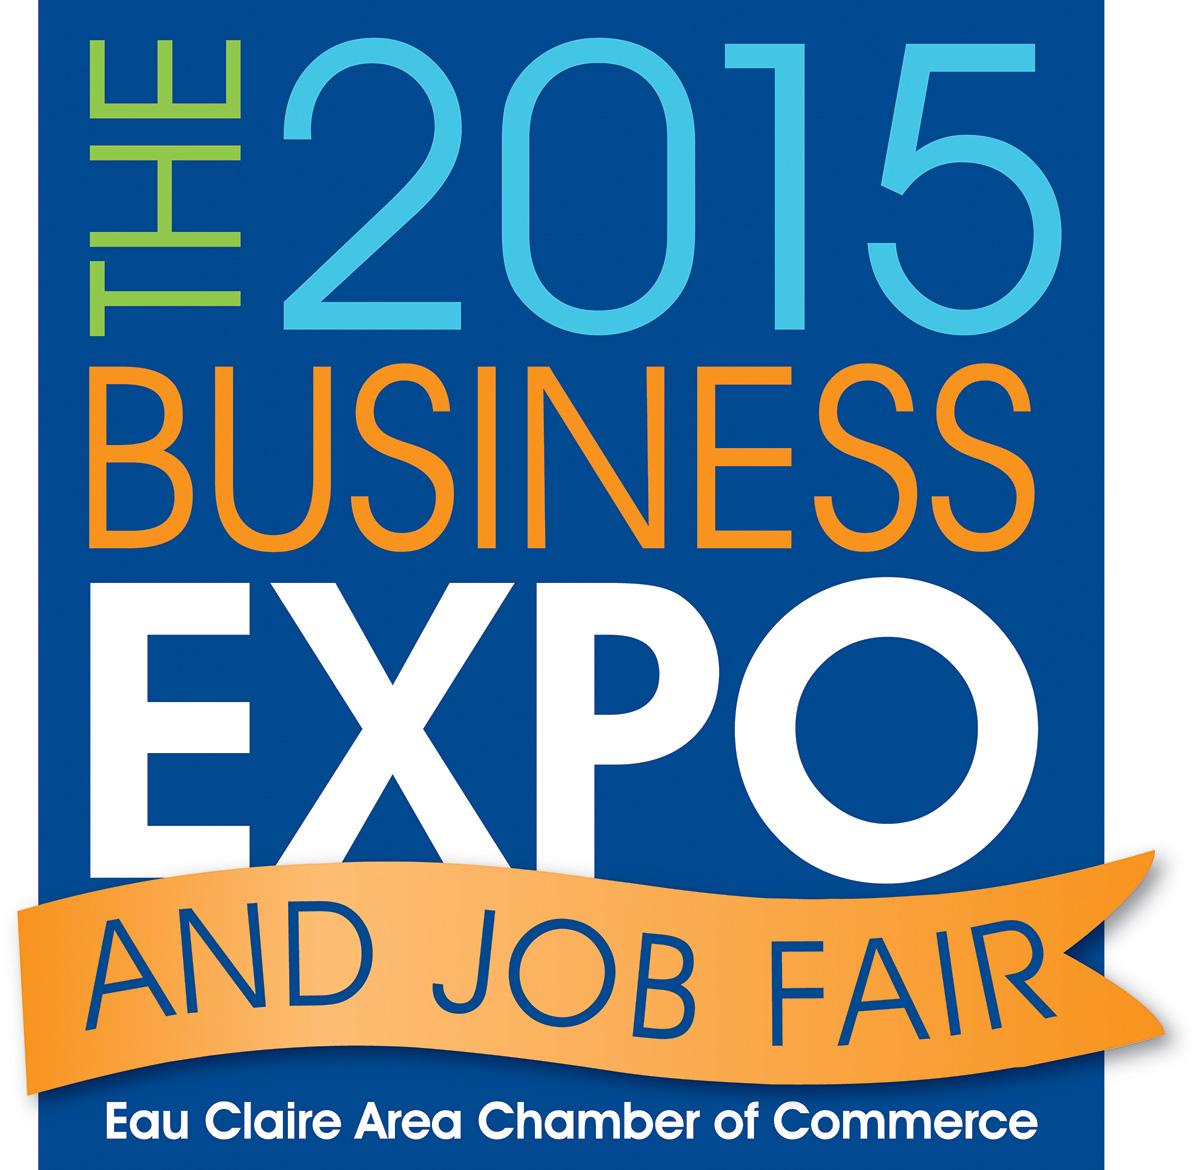 2015 Business Expo & Job Fair Seminars - Top 10 Tips to Create an ...